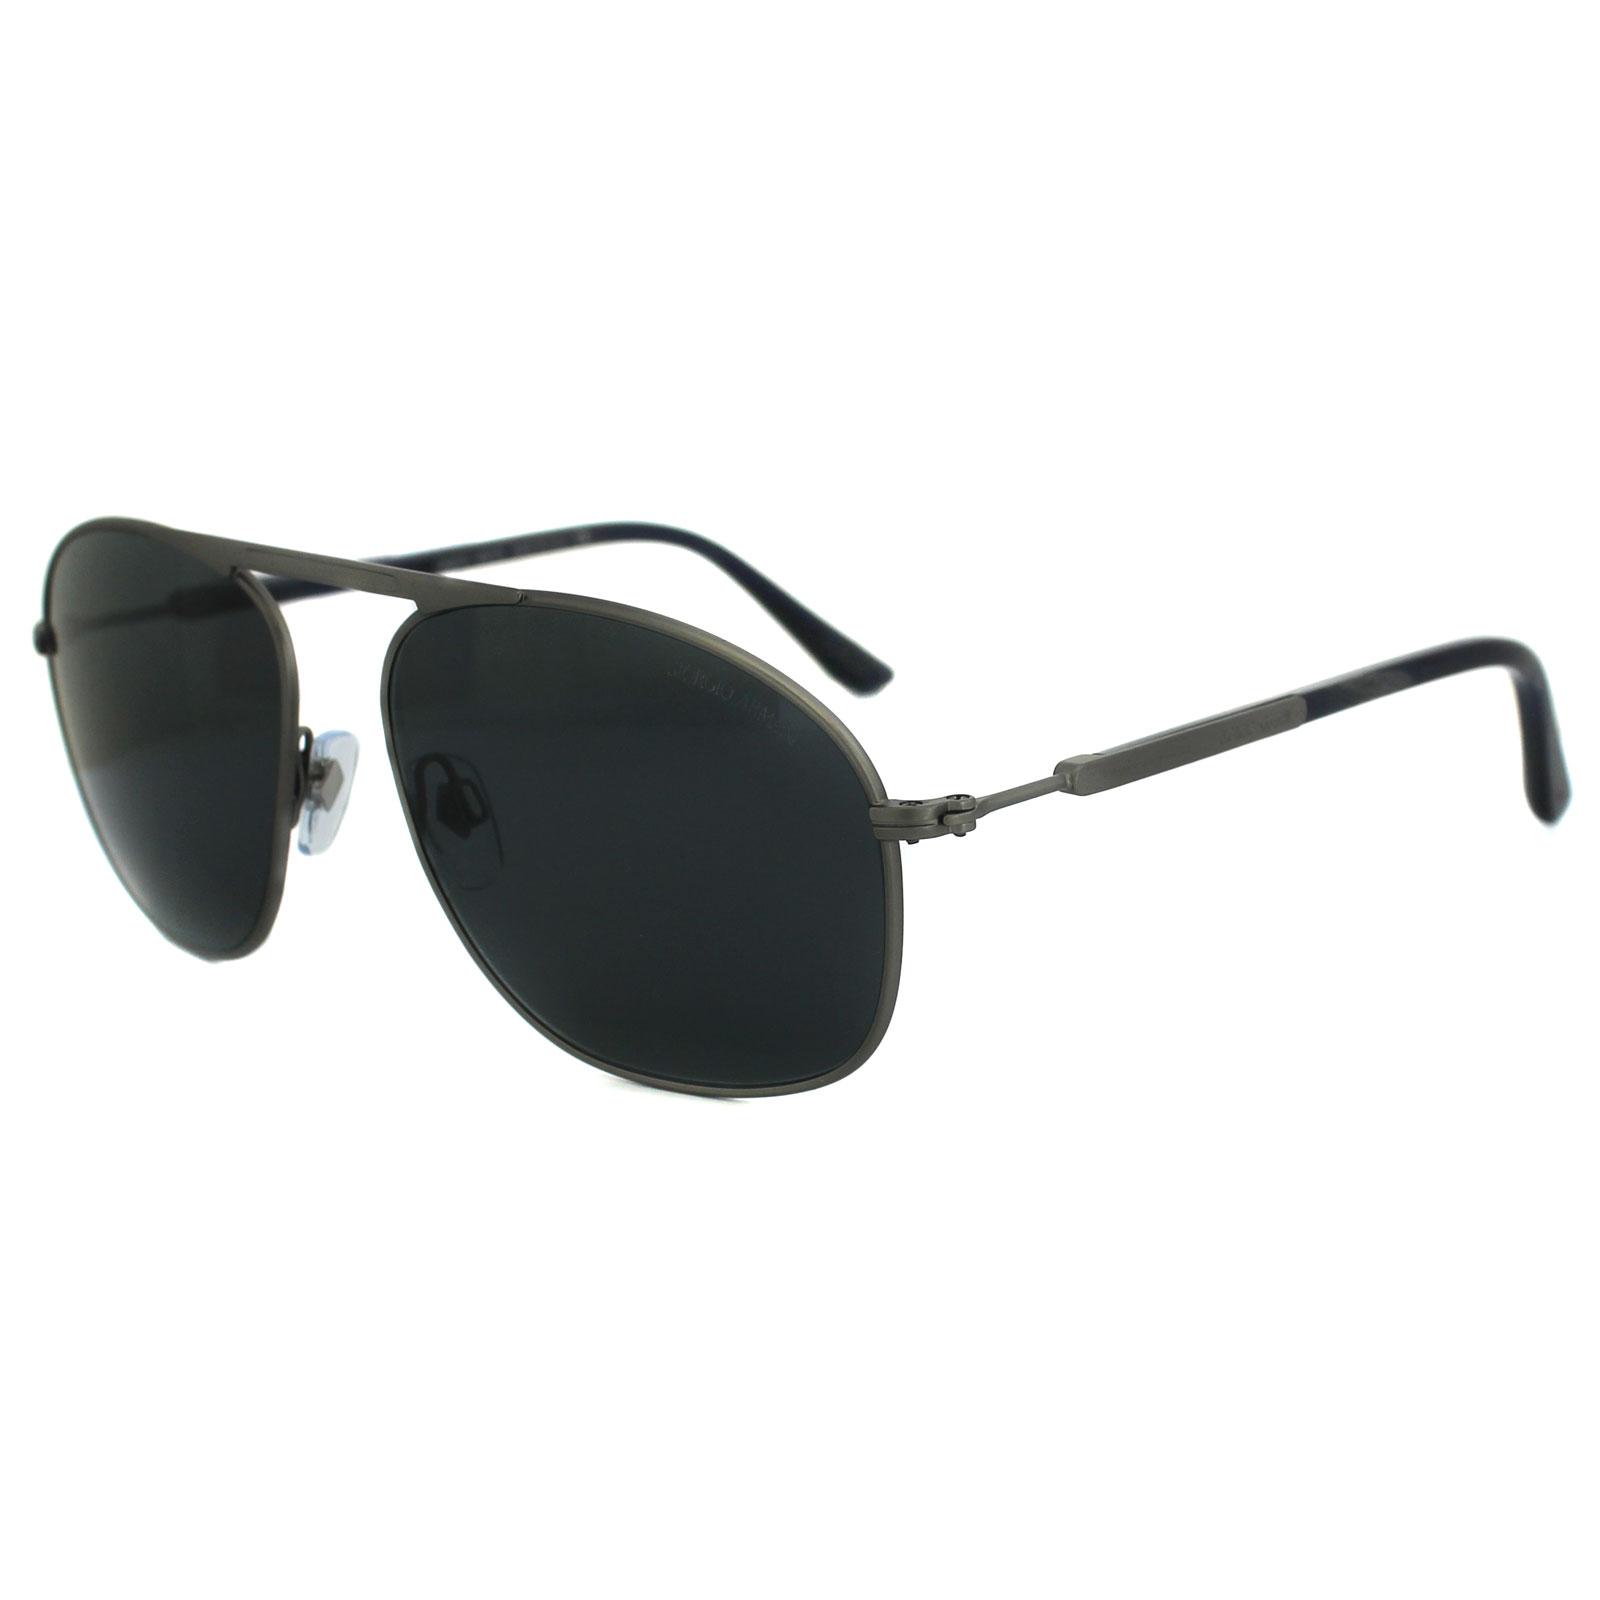 30a7f378547e Sentinel Giorgio Armani Sunglasses AR6015 3032R5 Matt Brushed Ruthenium  Grey Blue